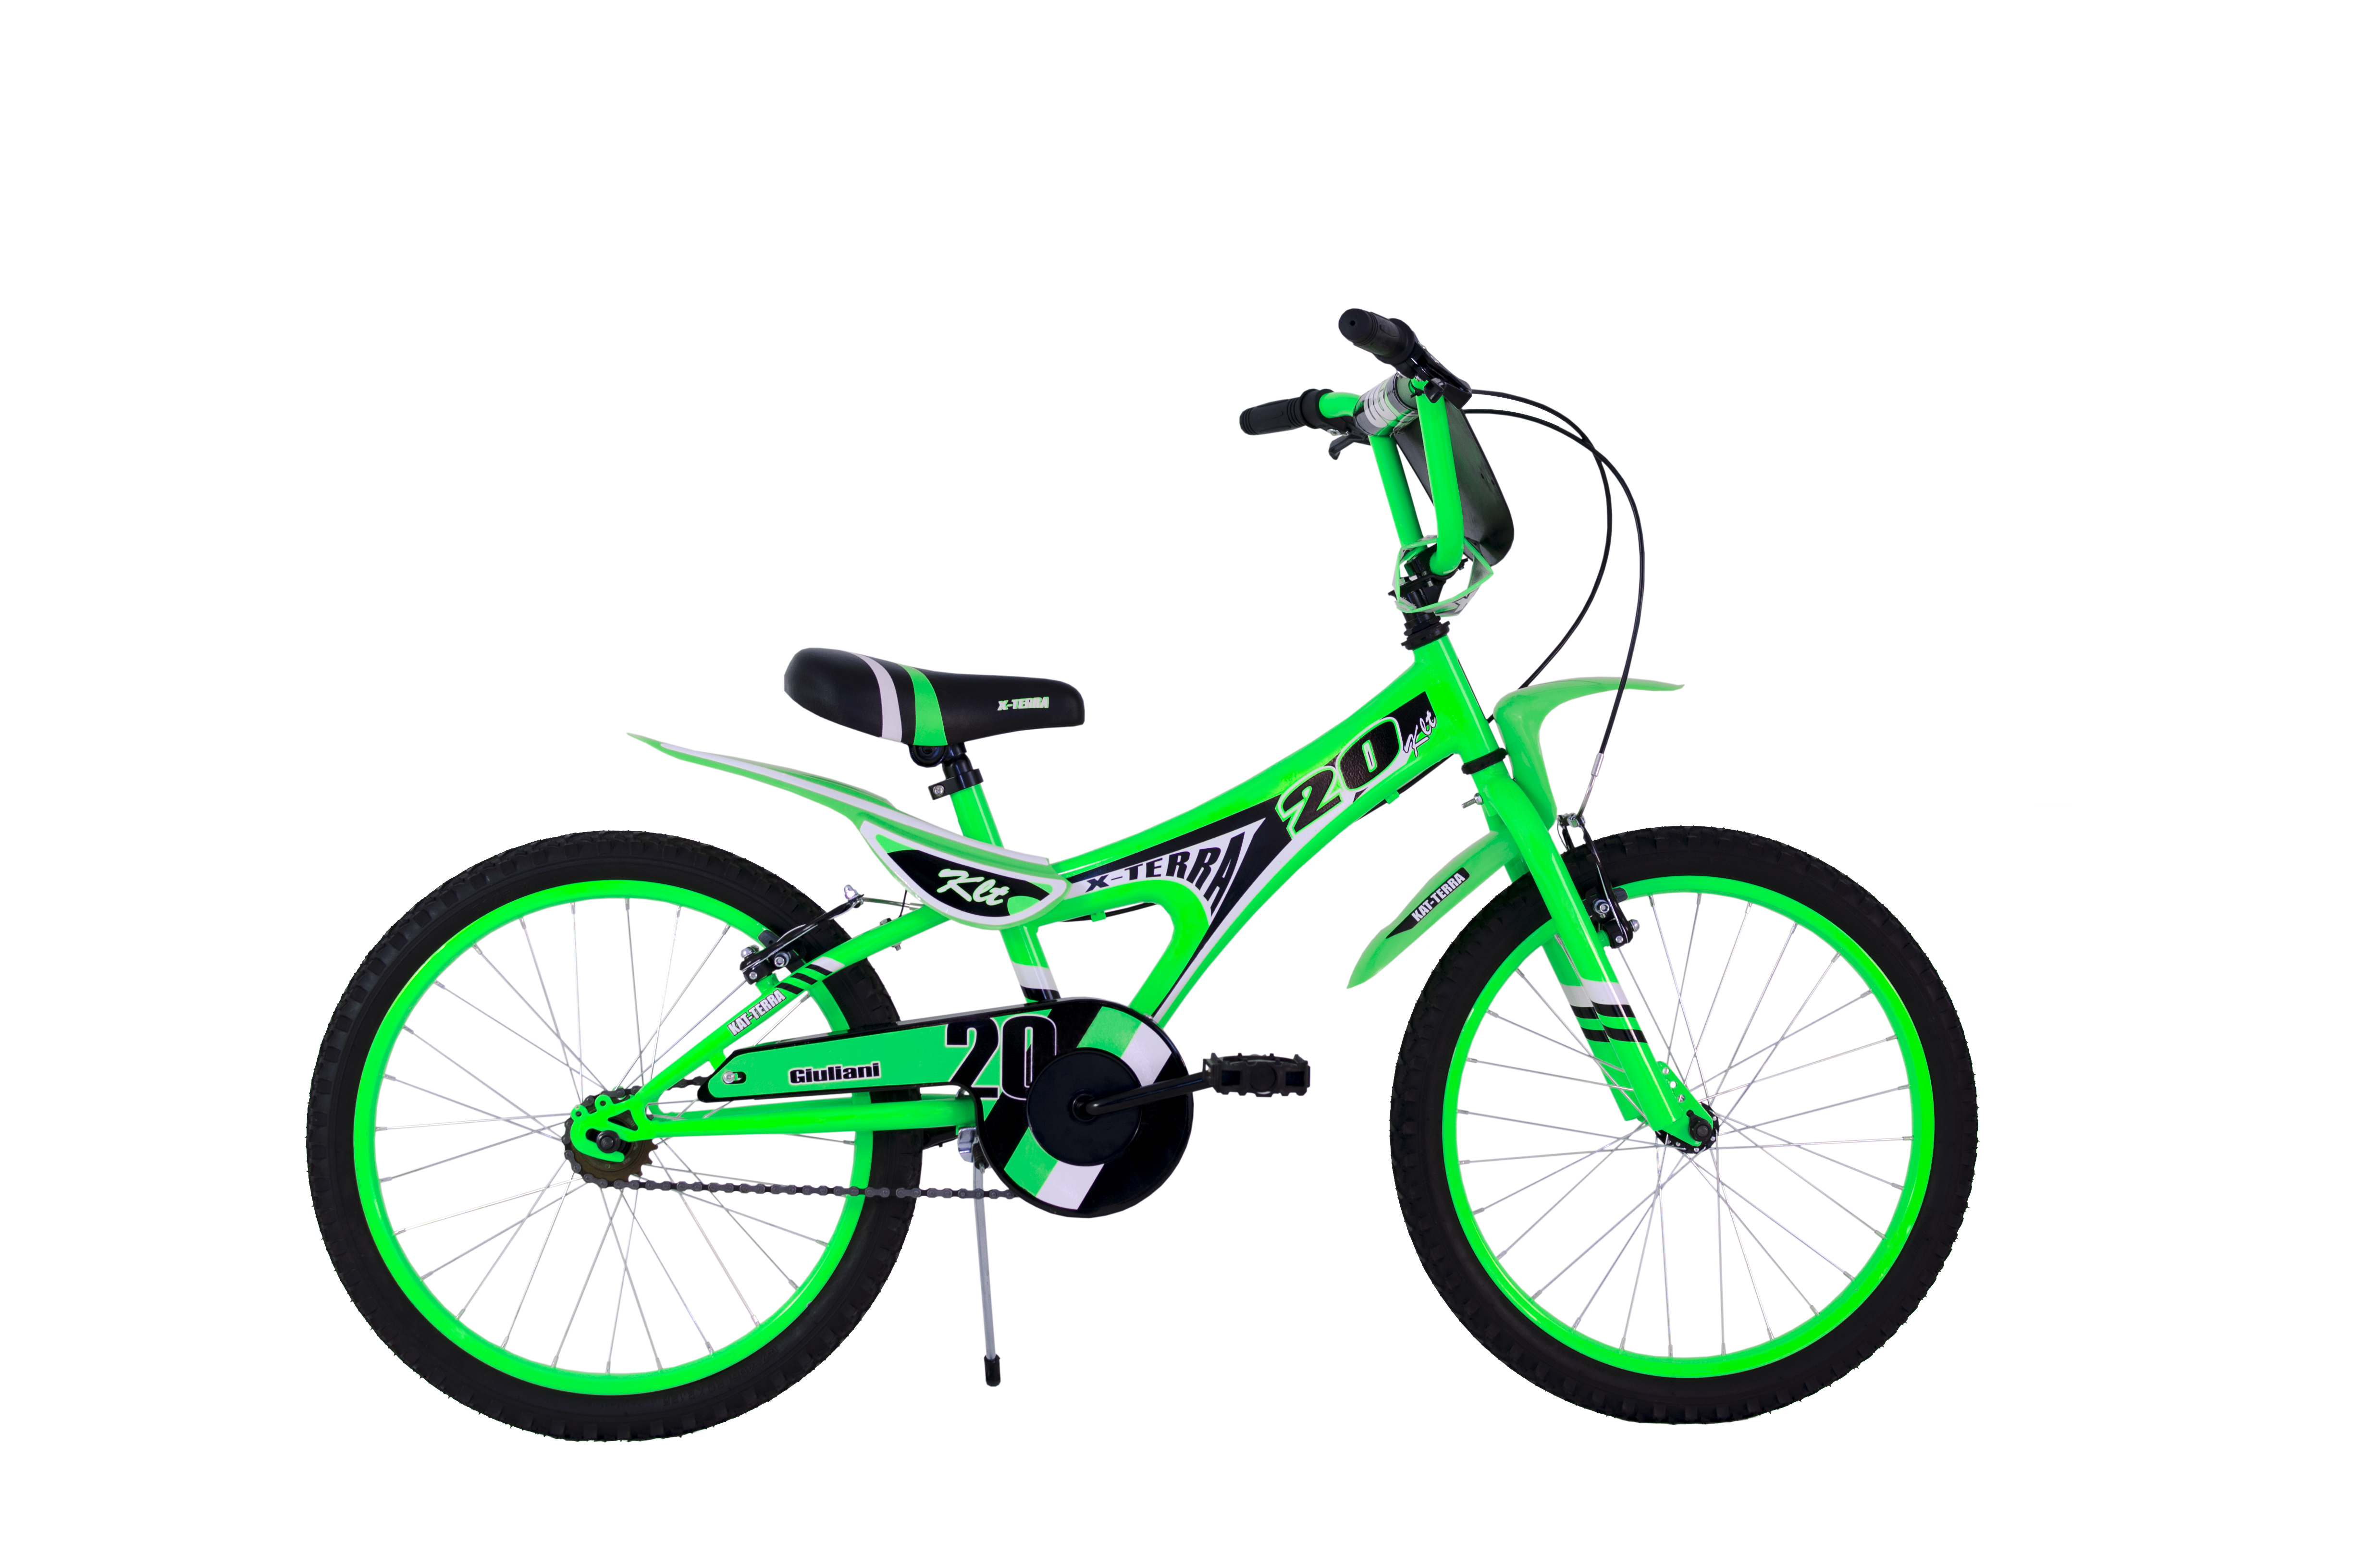 67050fff8 Bicicleta Cross KLT R-20